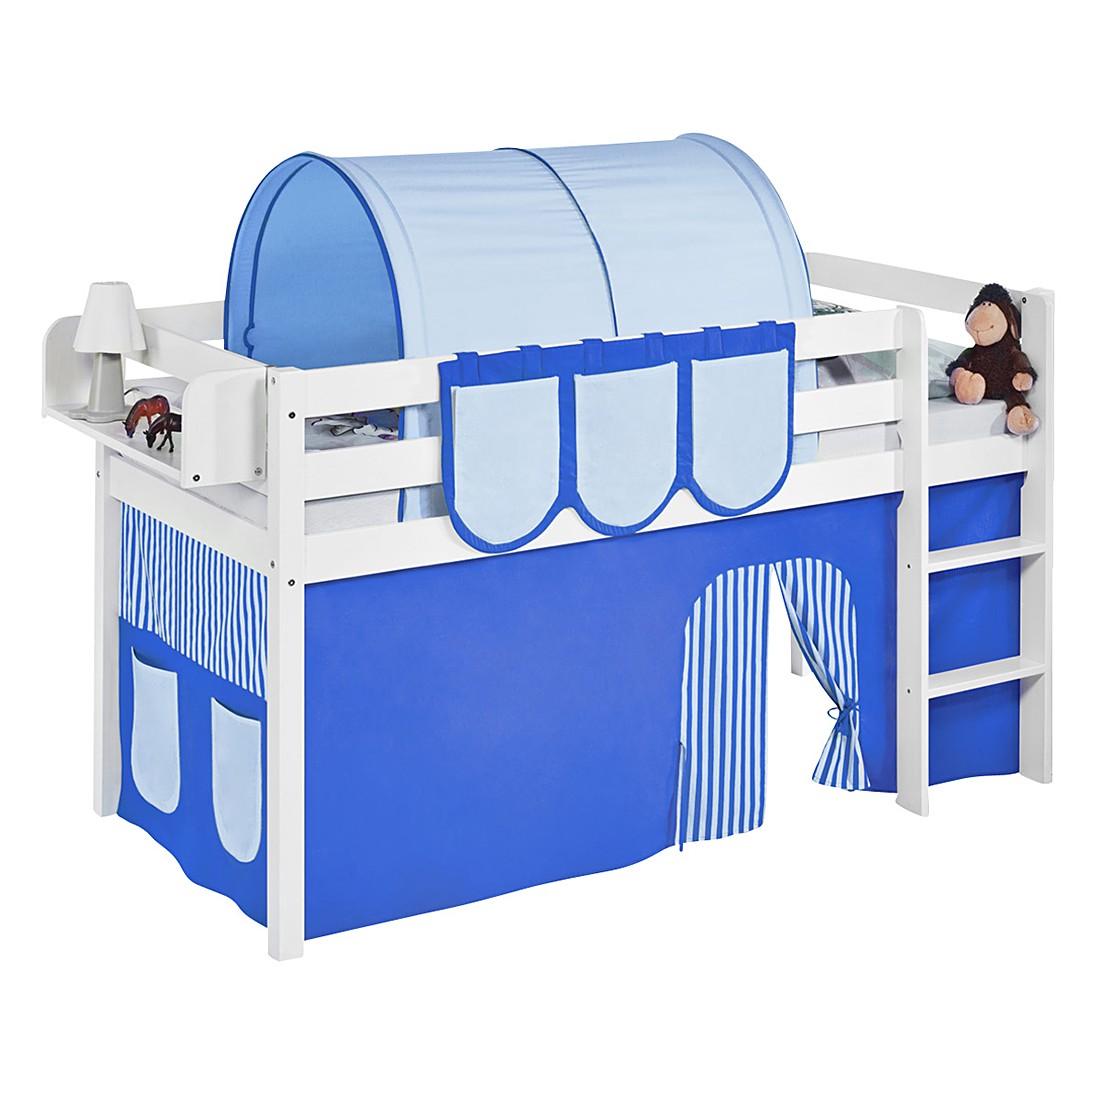 Spielbett JELLE Blau